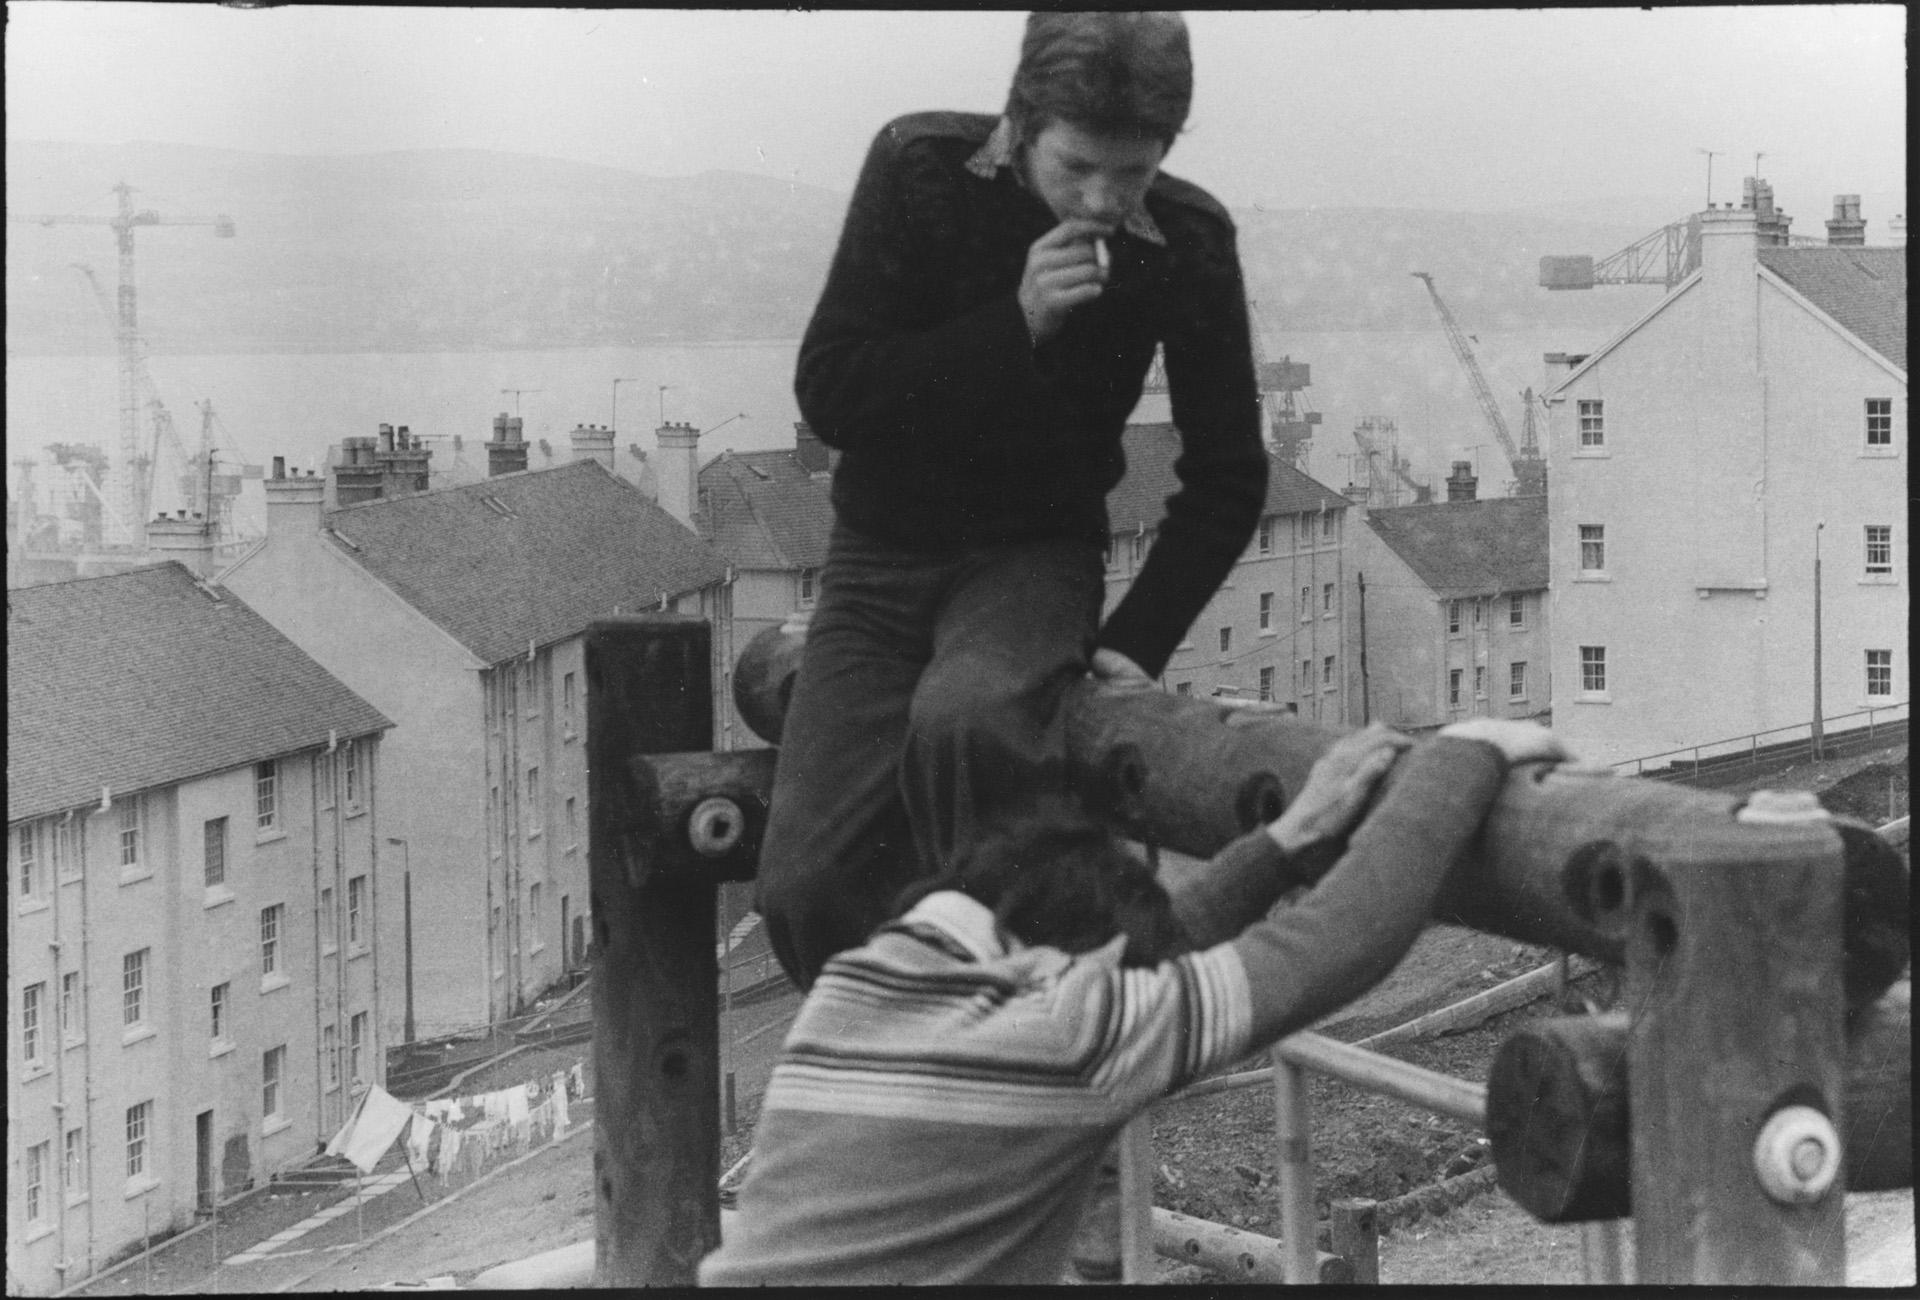 Larry Herman: Clydeside 1974-76